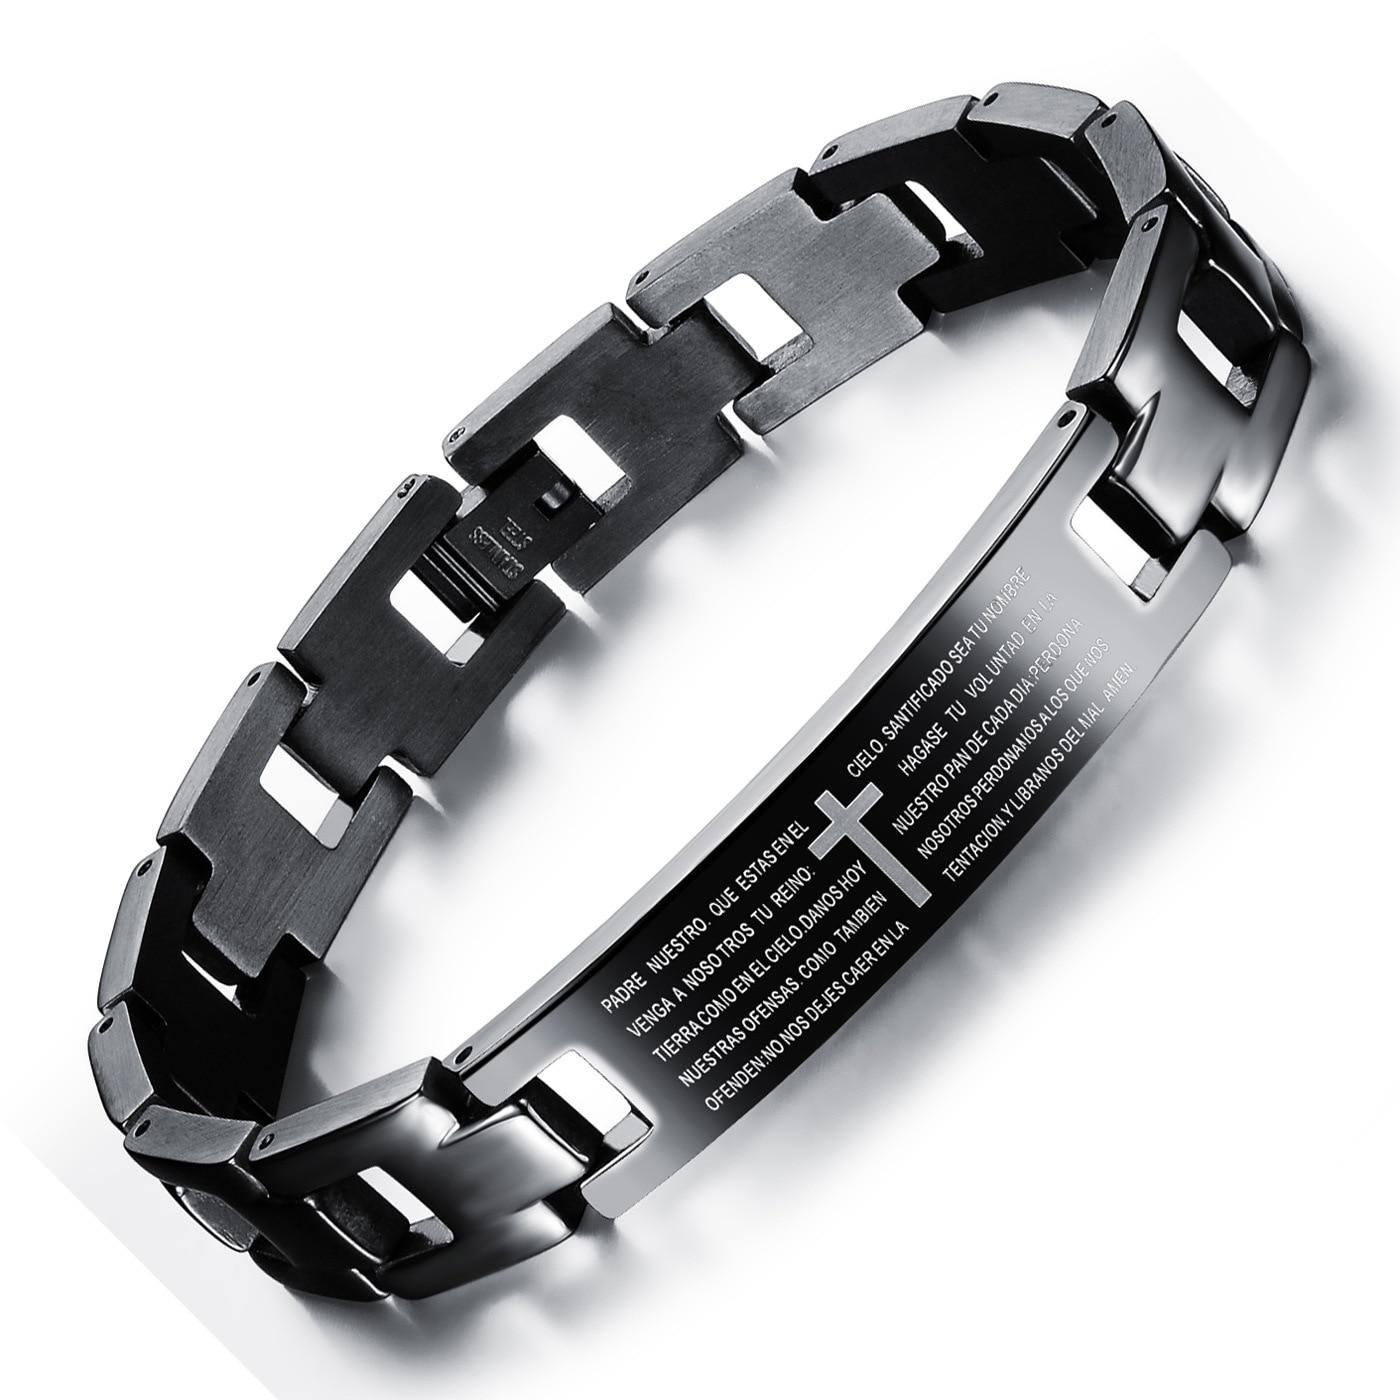 Spanisch Bibel Herr Gebet Hand Armbänder & Armreifen Korrosion Kreuz Edelstahl herren Armband